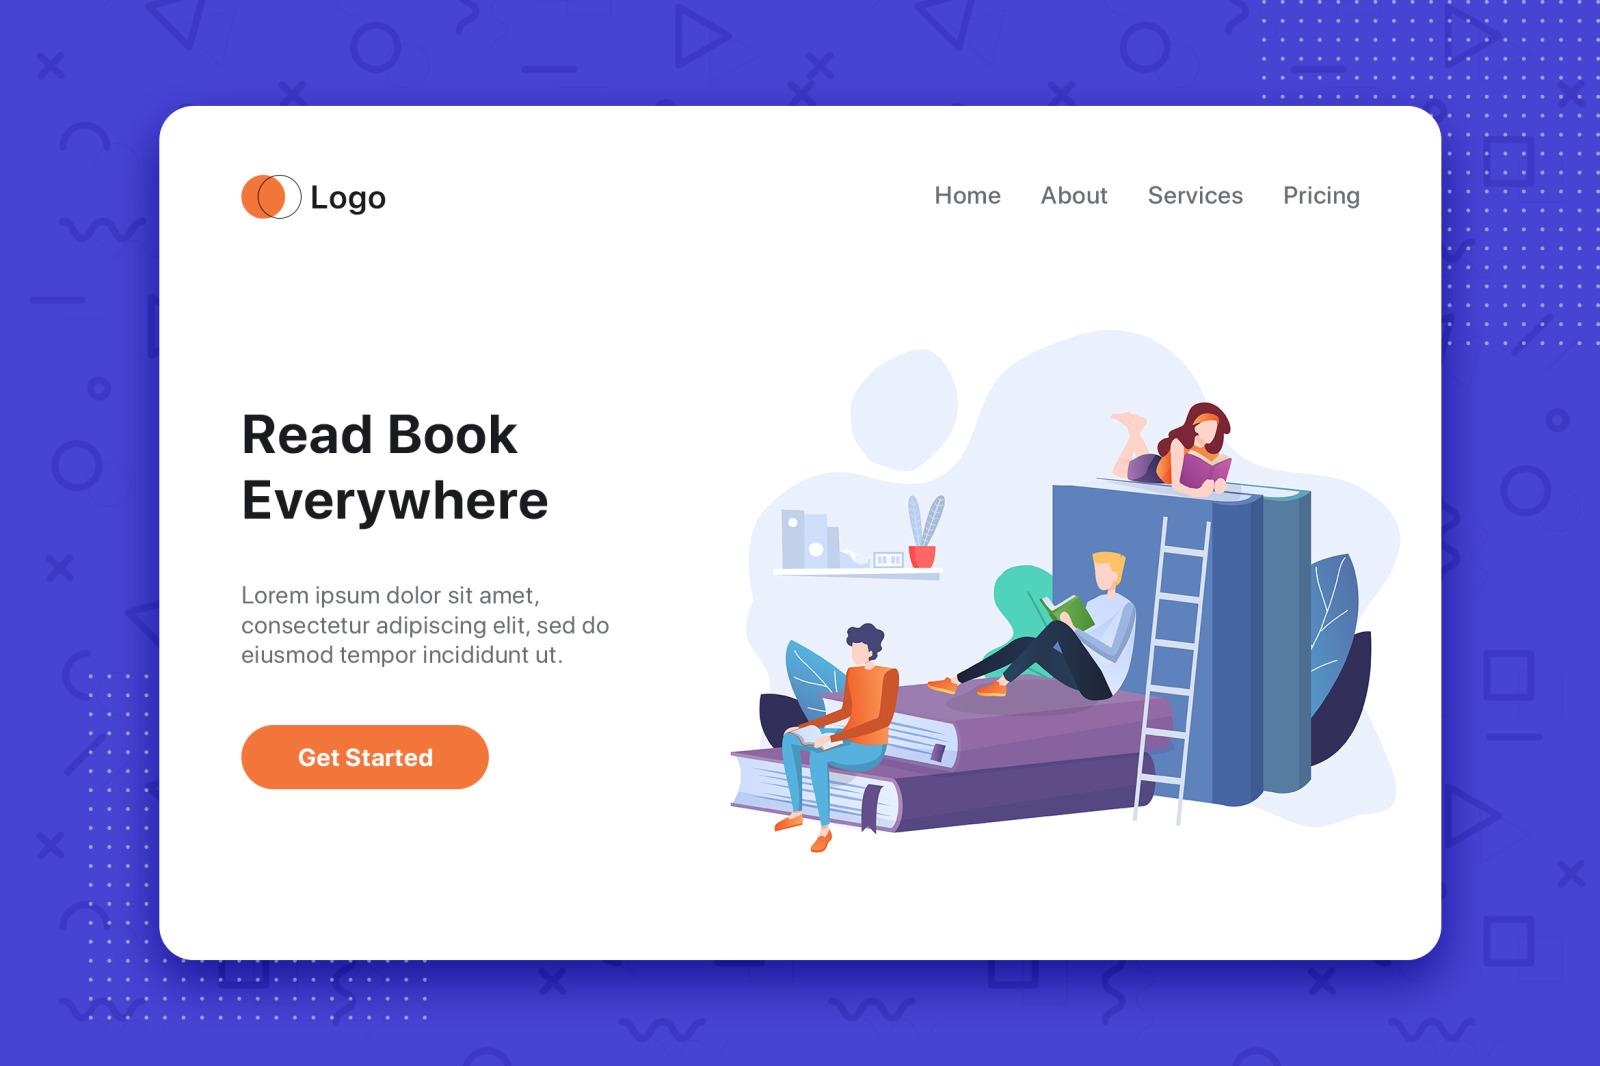 [Part 7] Website Illustrations Set